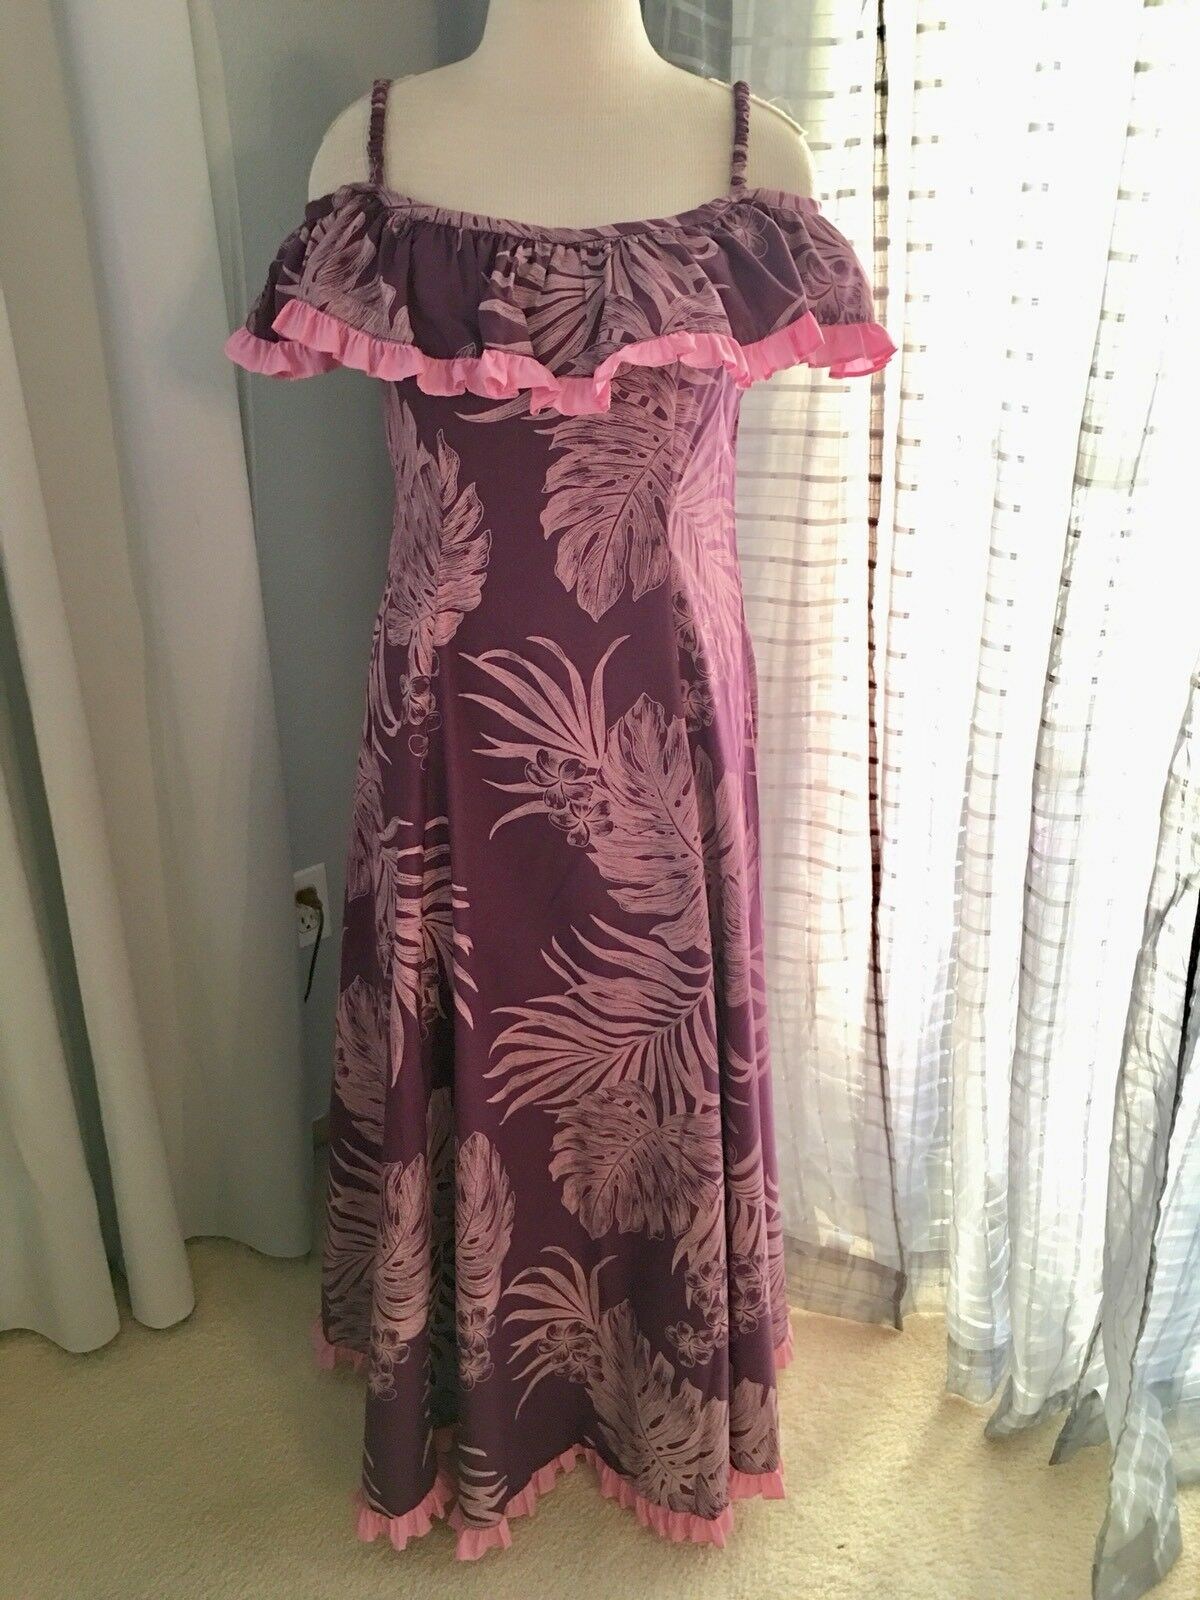 NEW lila Rosa OFF THE SHOULDER HAWAIIAN MUUMUU HULA DRESS Größe 11-12